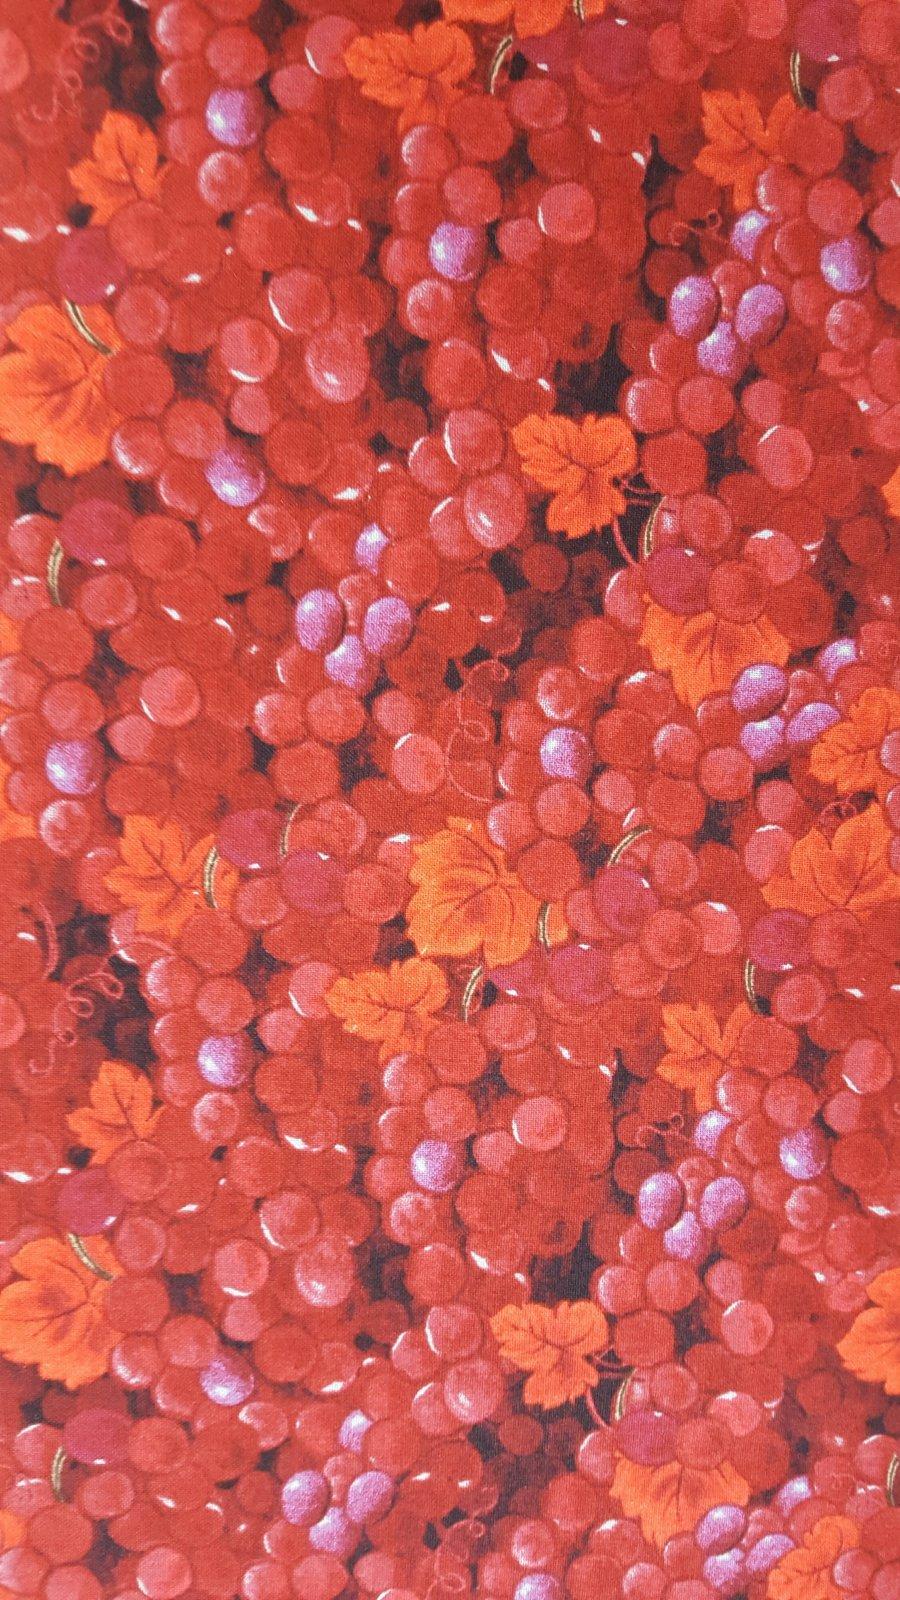 It's Wine O'Clock Red Grapes (F2654)